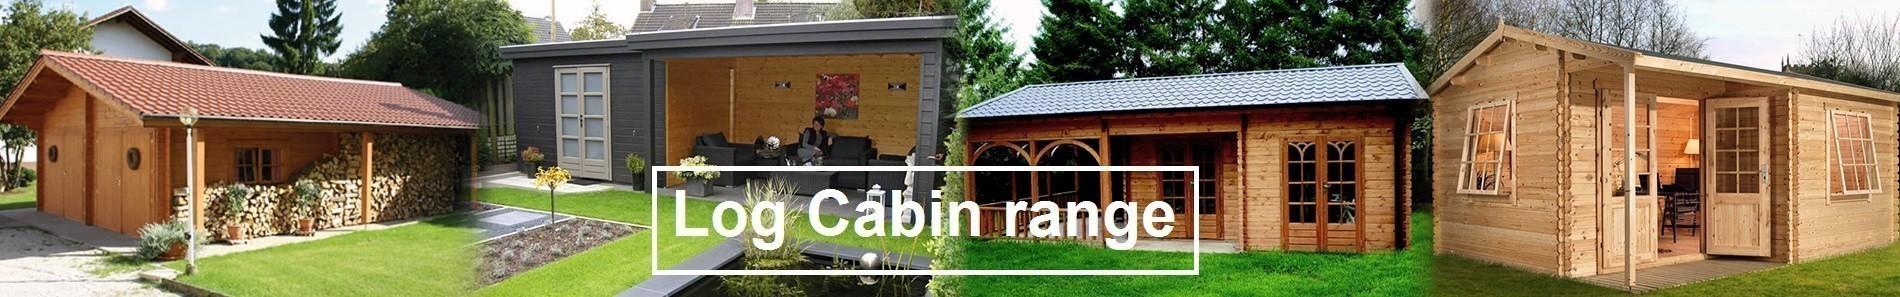 Log Cabins, Garden Buildings